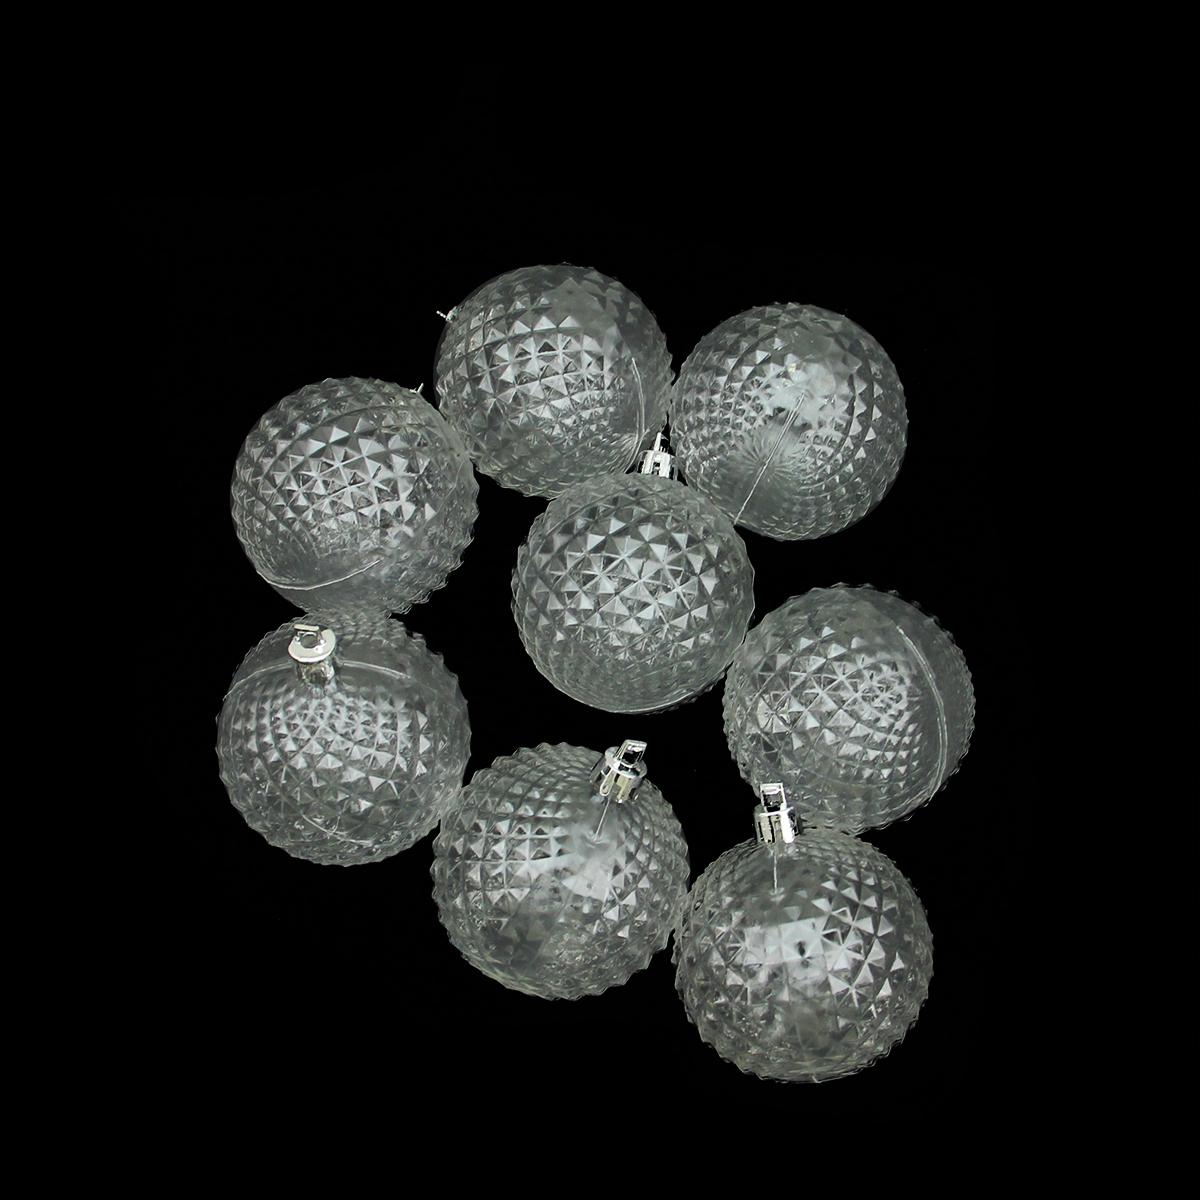 "8ct Clear Transparent Diamond Cut Shatterproof Christmas Ball Ornaments 2.5"""